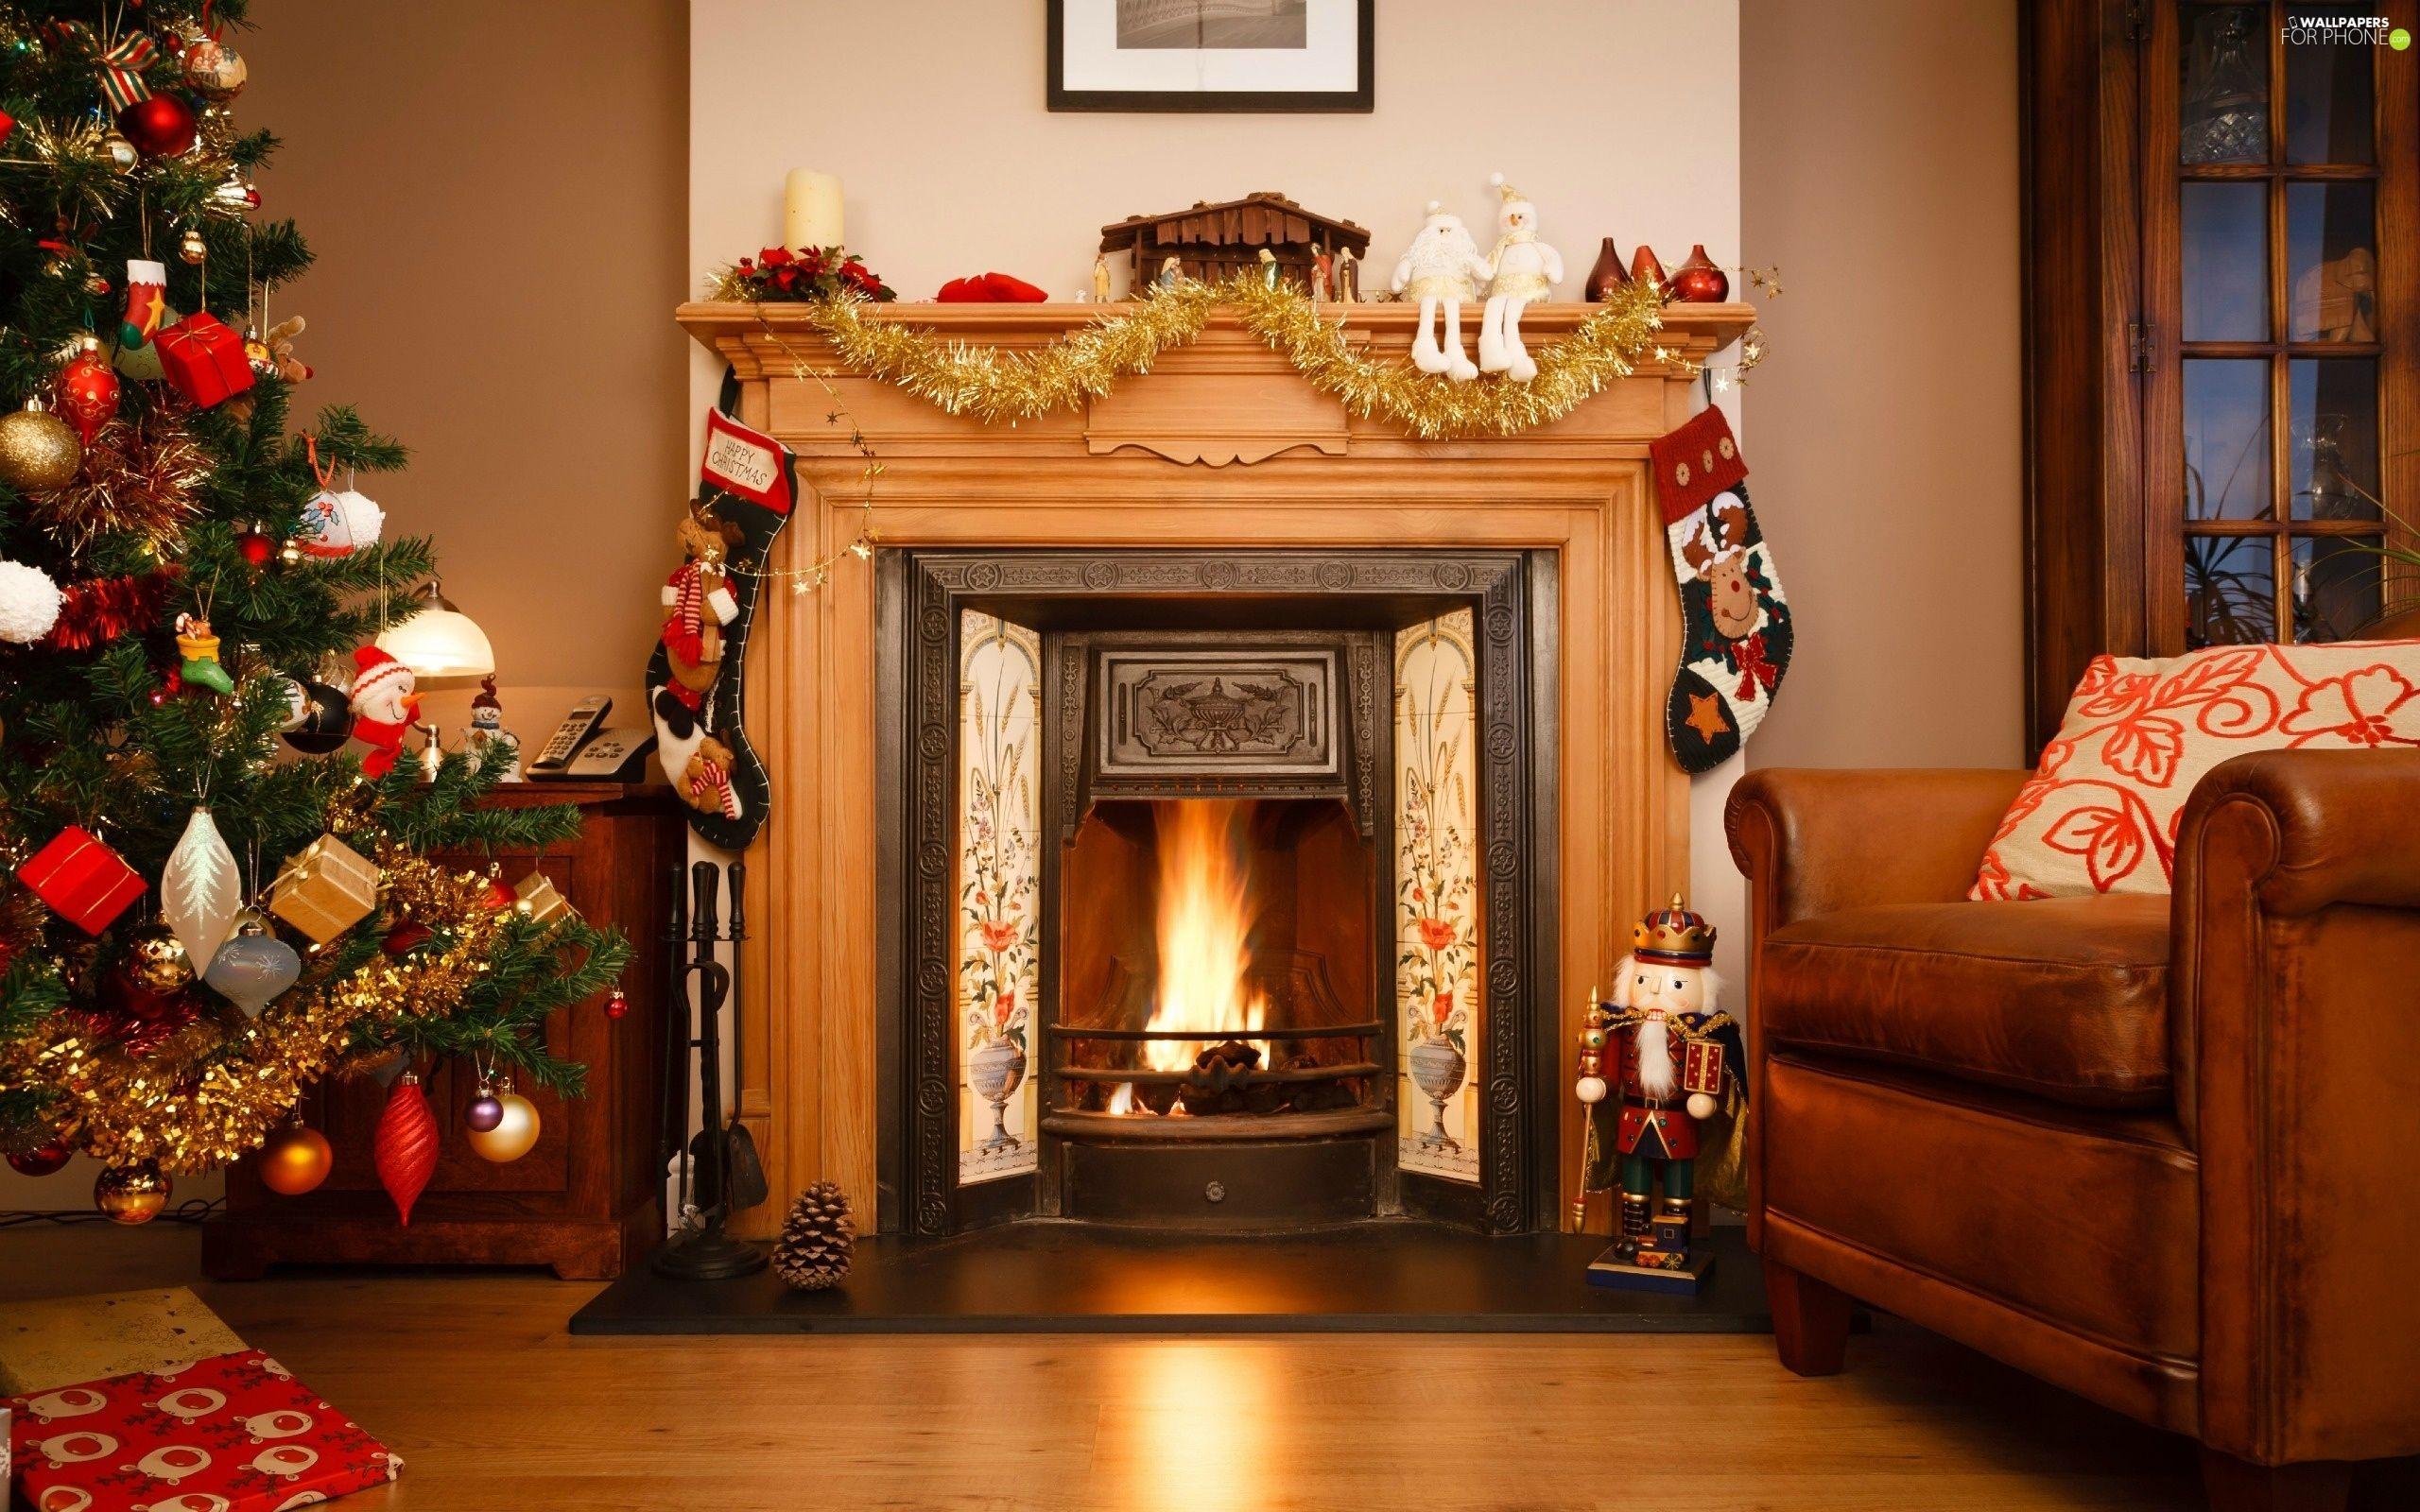 Christmas house decorations inside xmas holiday decor fireplace mantels also pin by jen hartnett on fireplaces pinterest rh